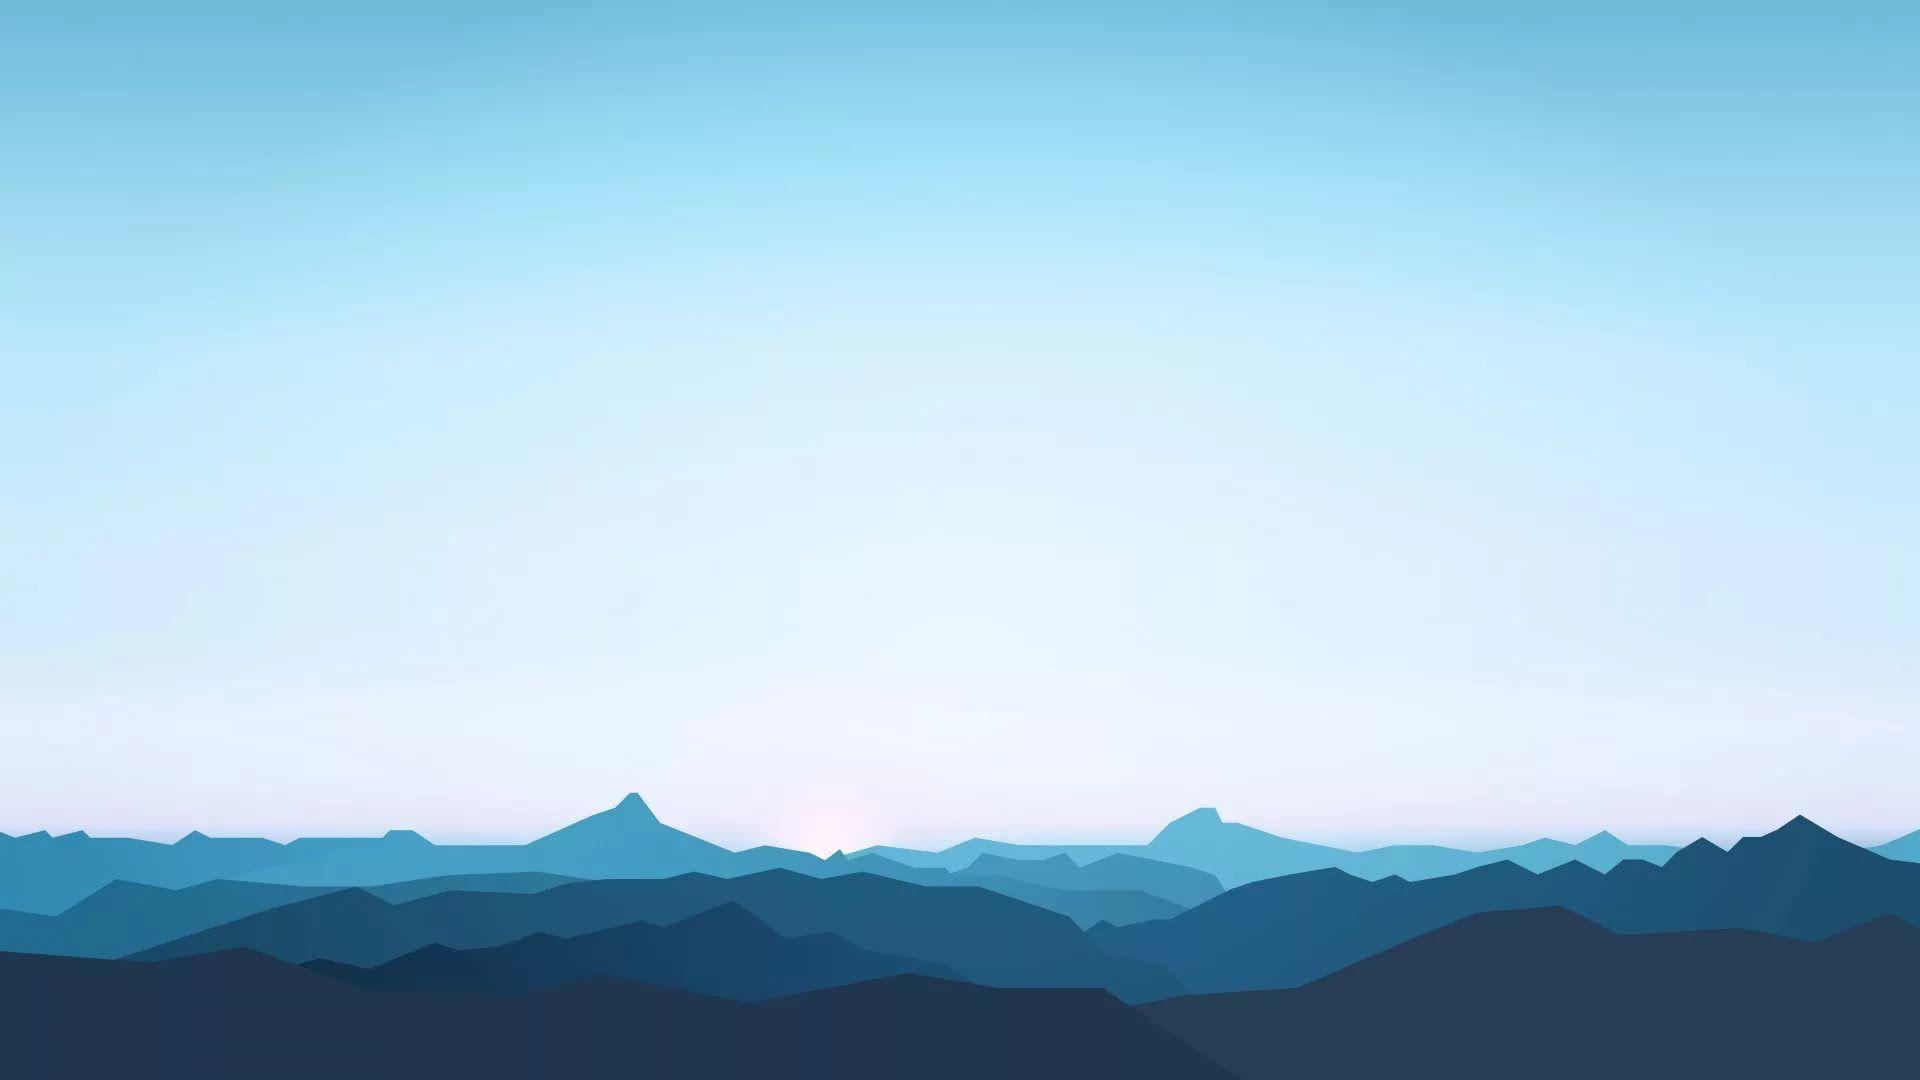 Minimalist Desktop desktop wallpaper